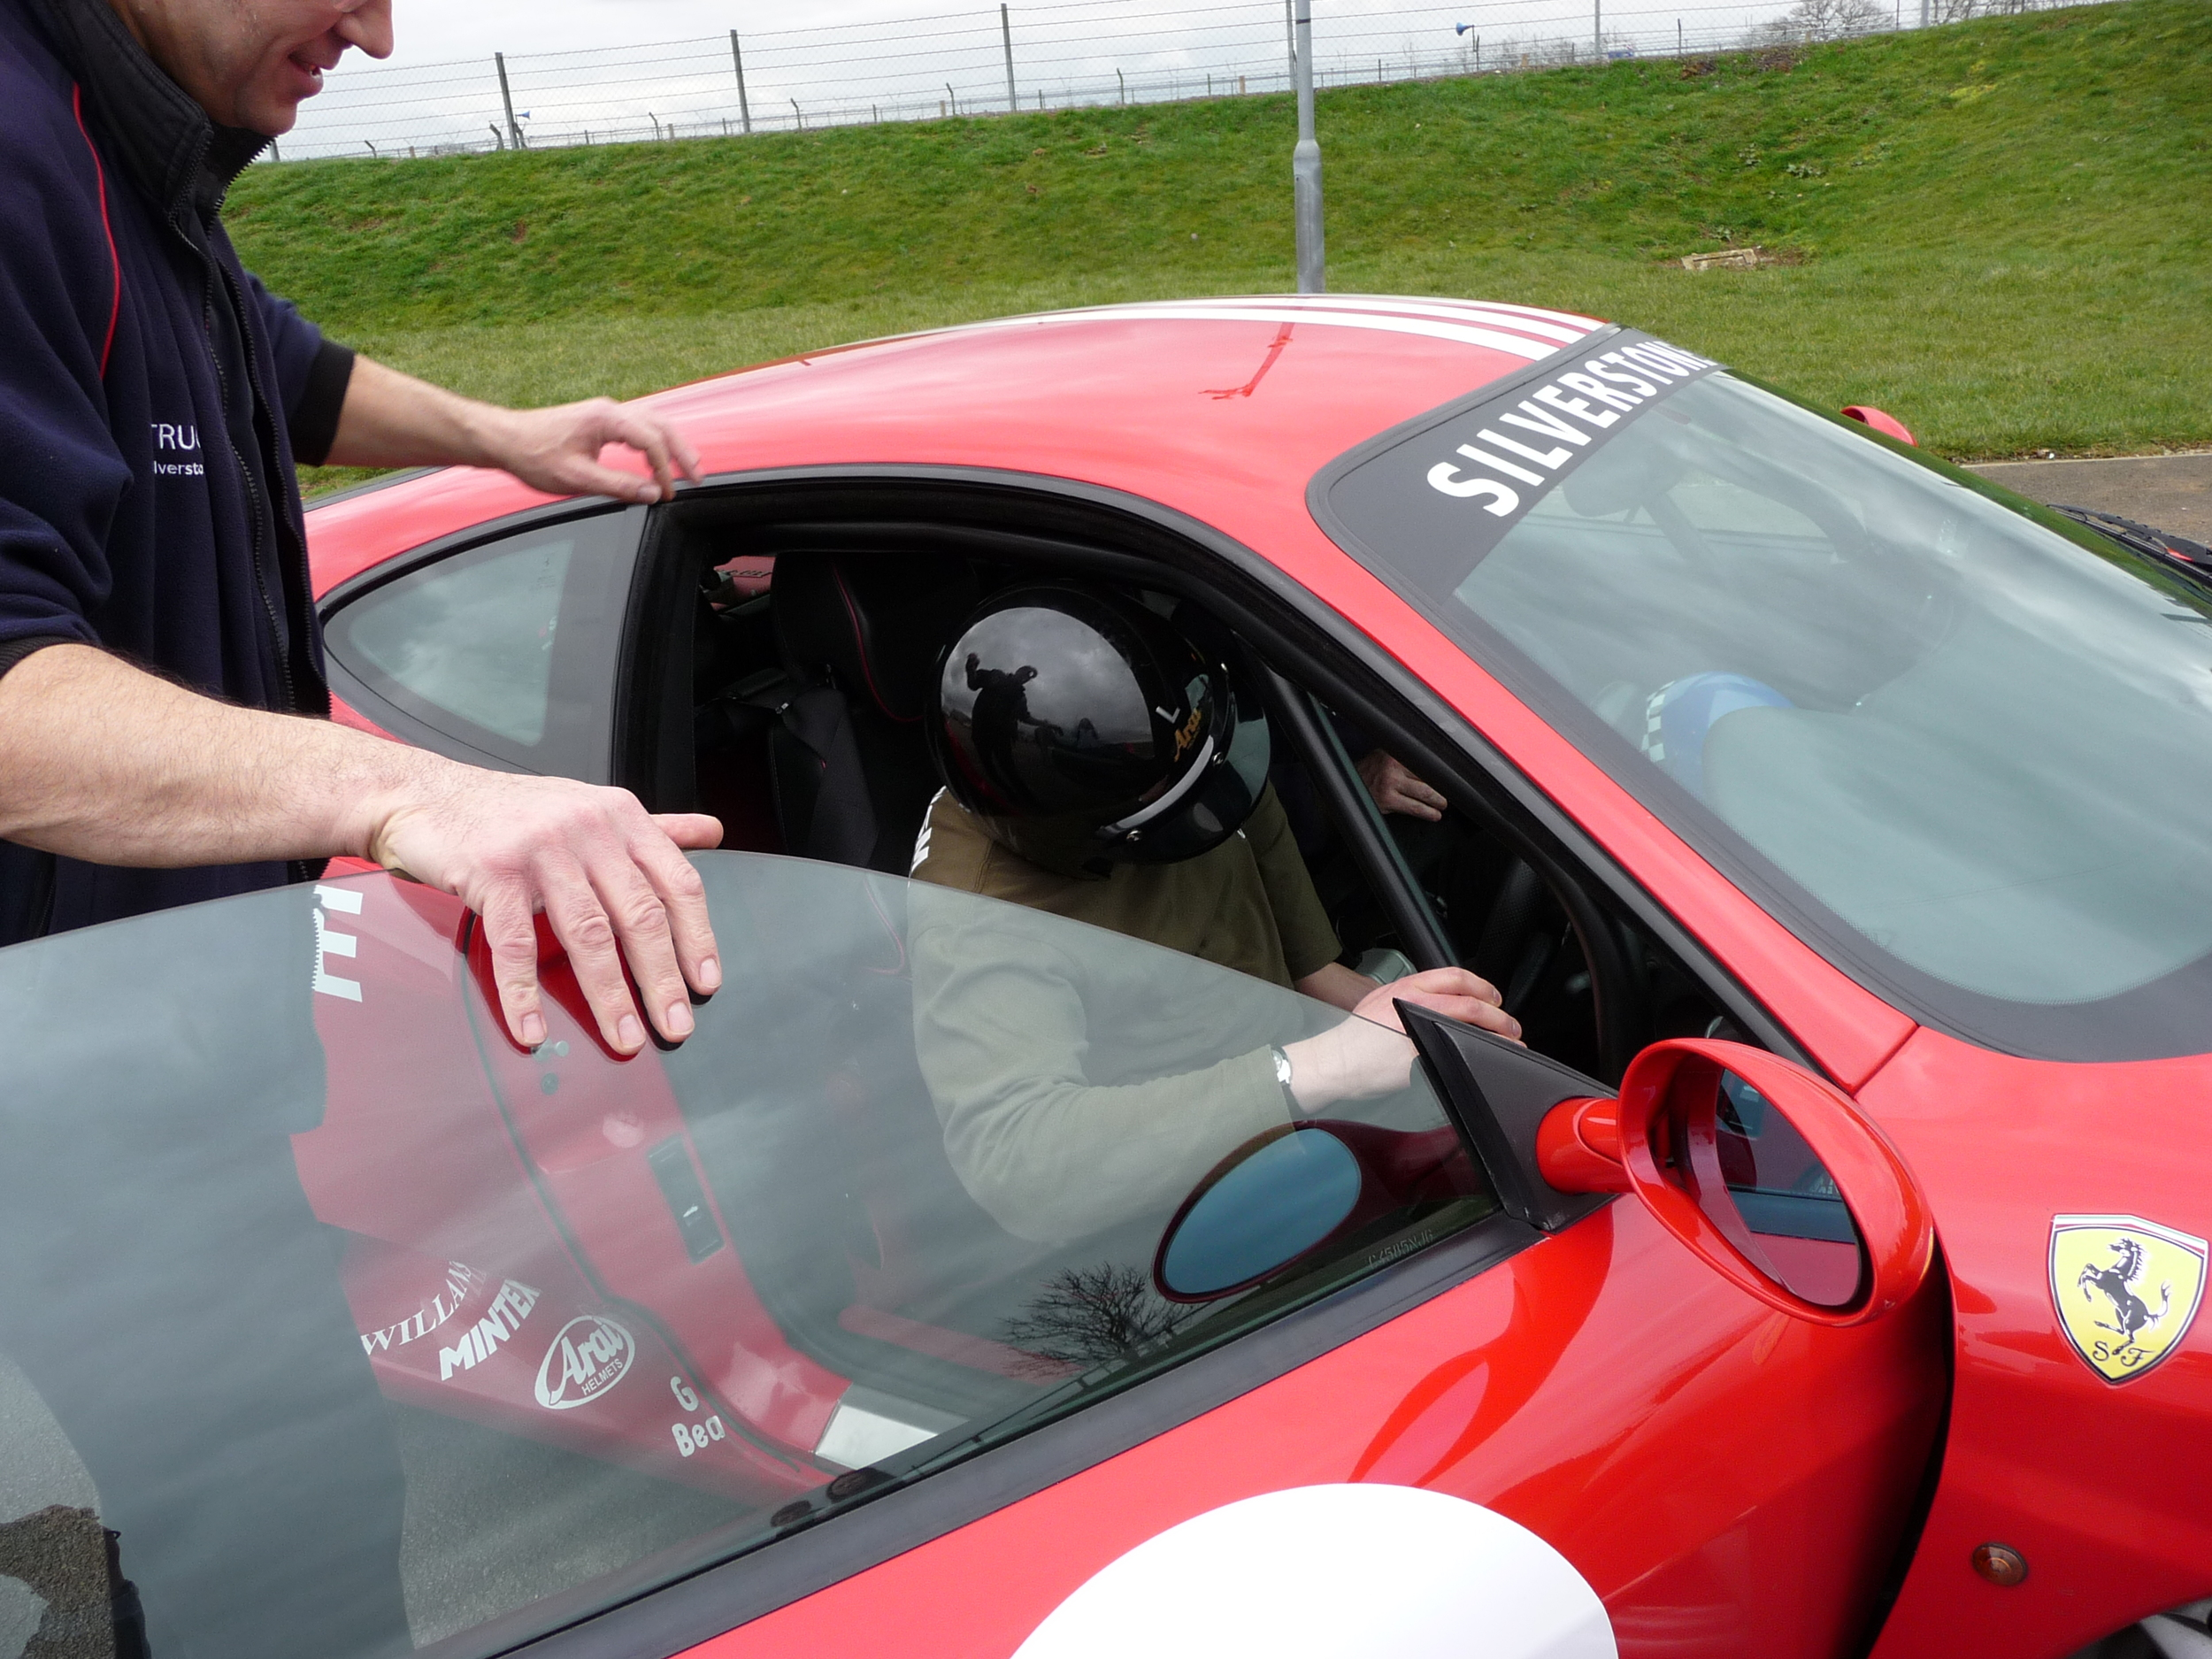 The Writing Man climbs inside his Ferrari 360 Modena